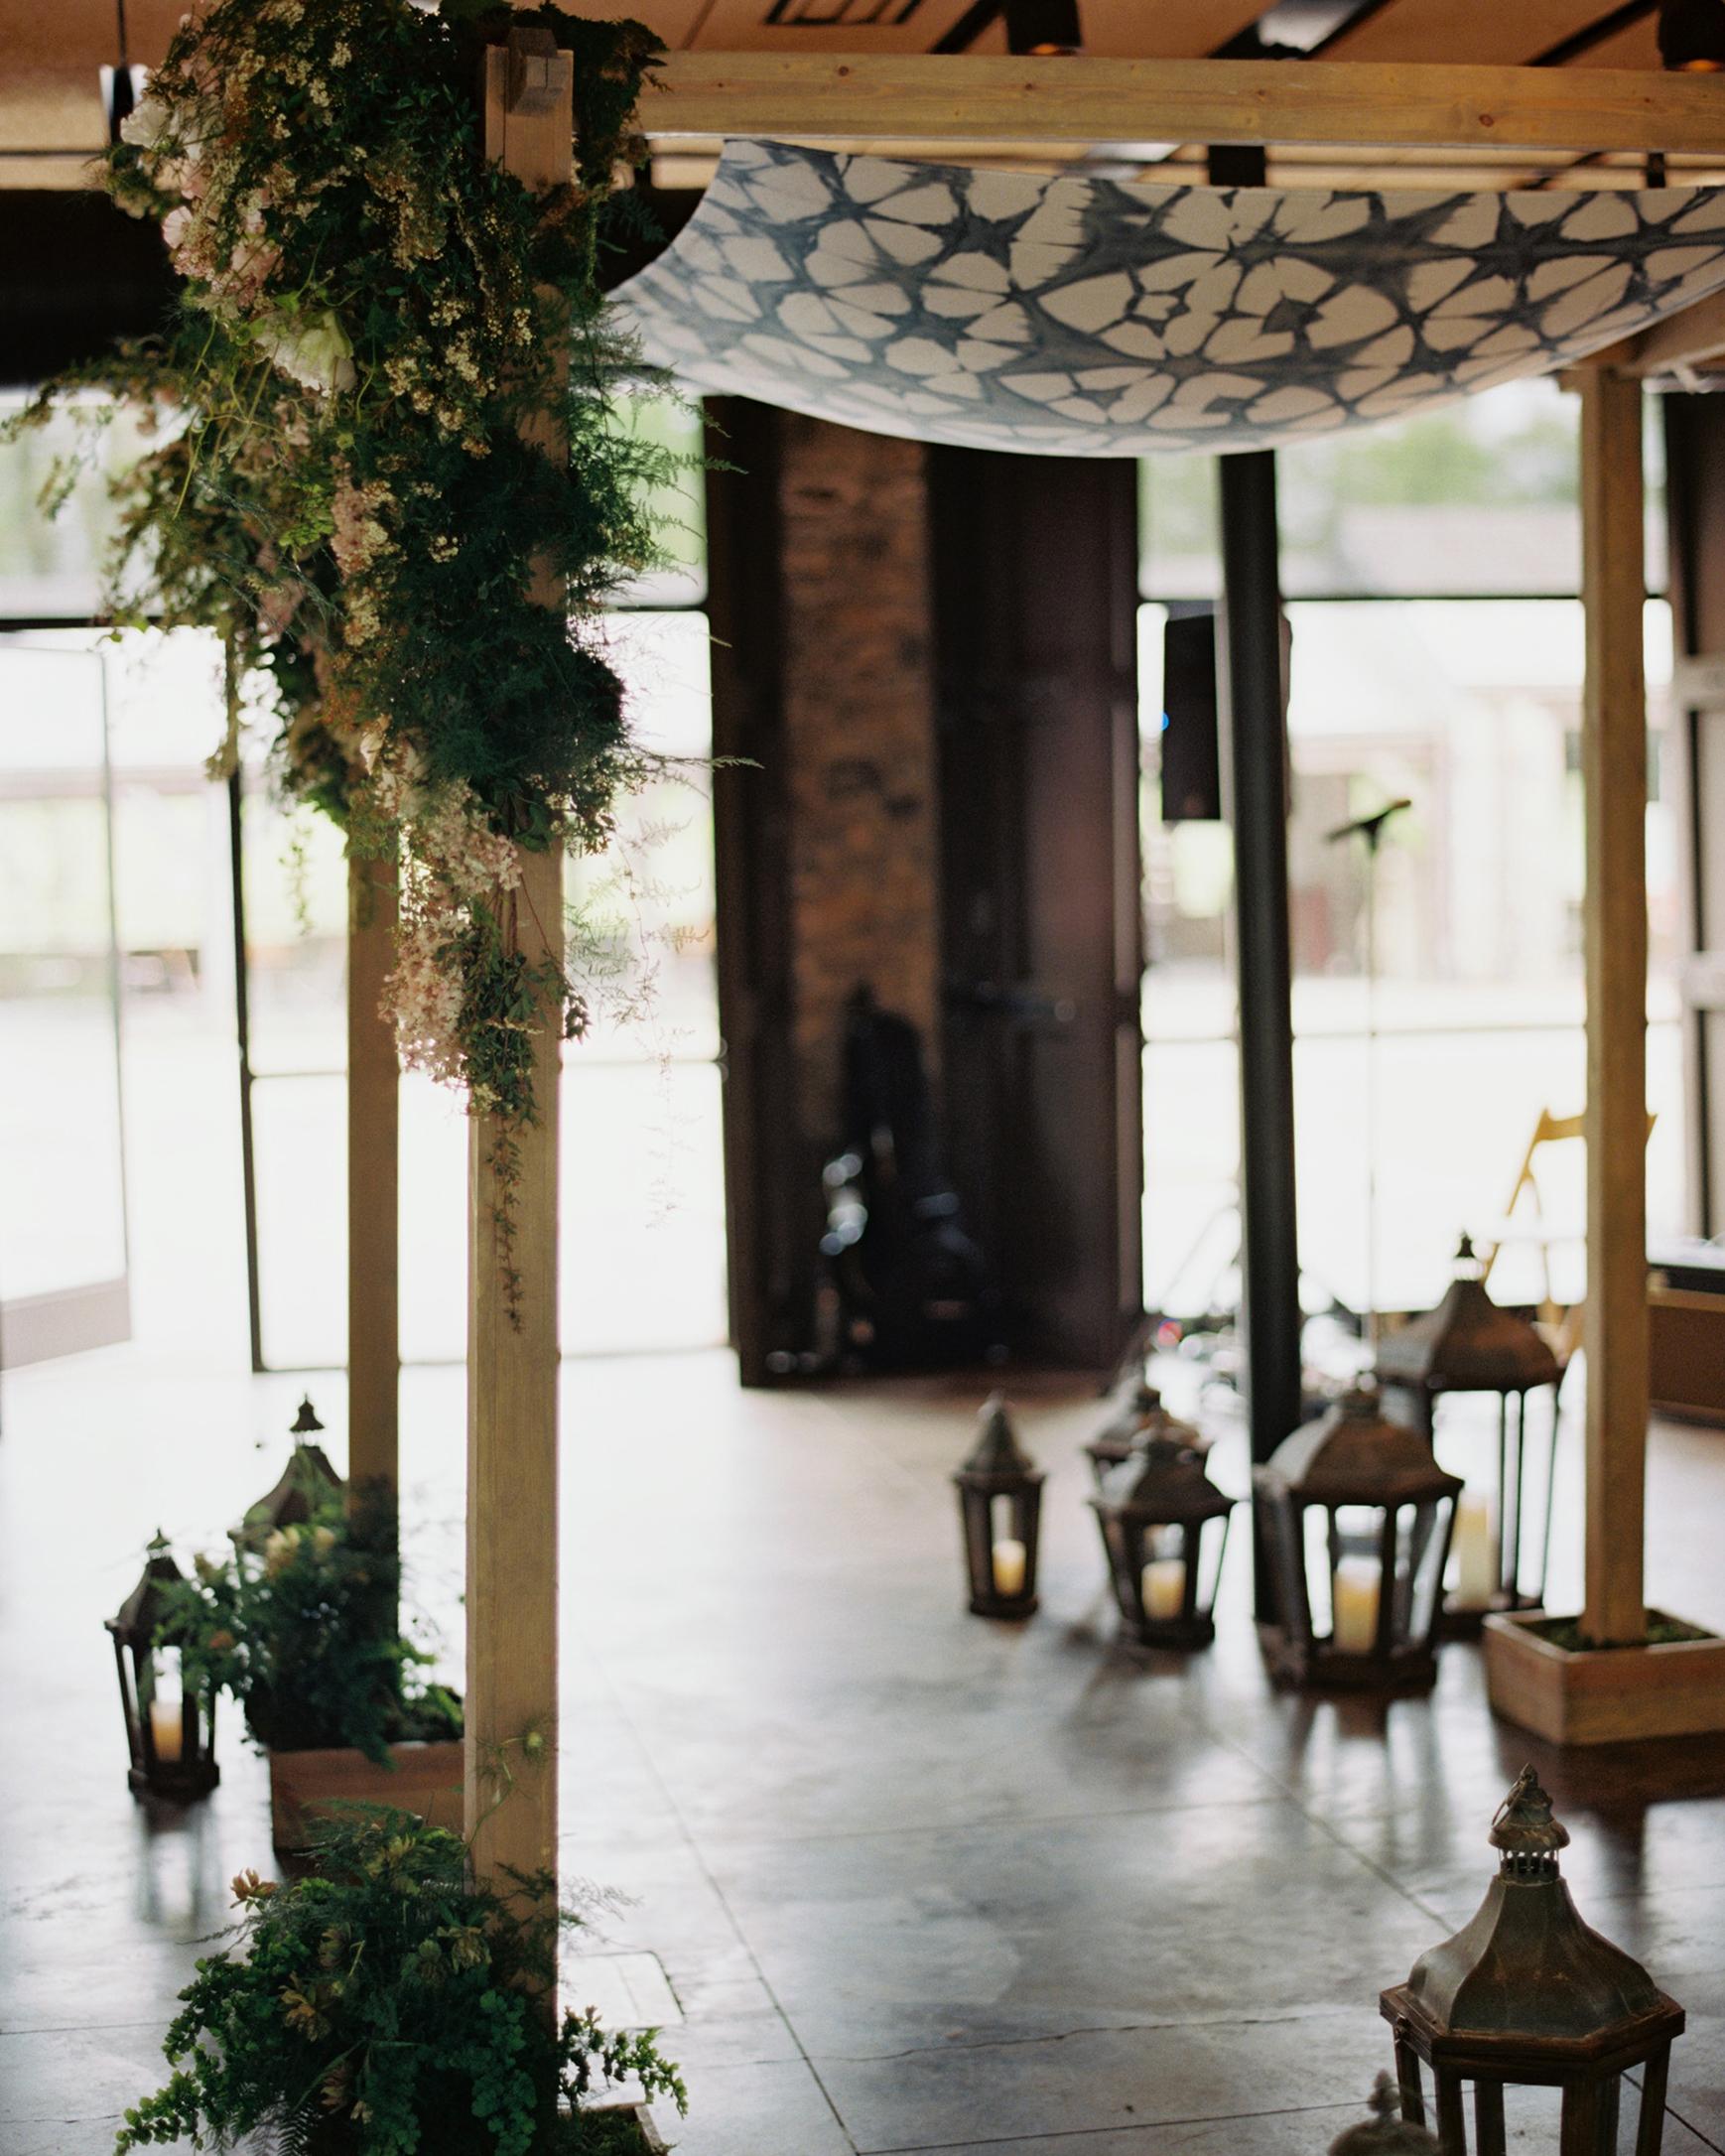 sydney-christina-wedding-huppa-045-s111743-0115.jpg